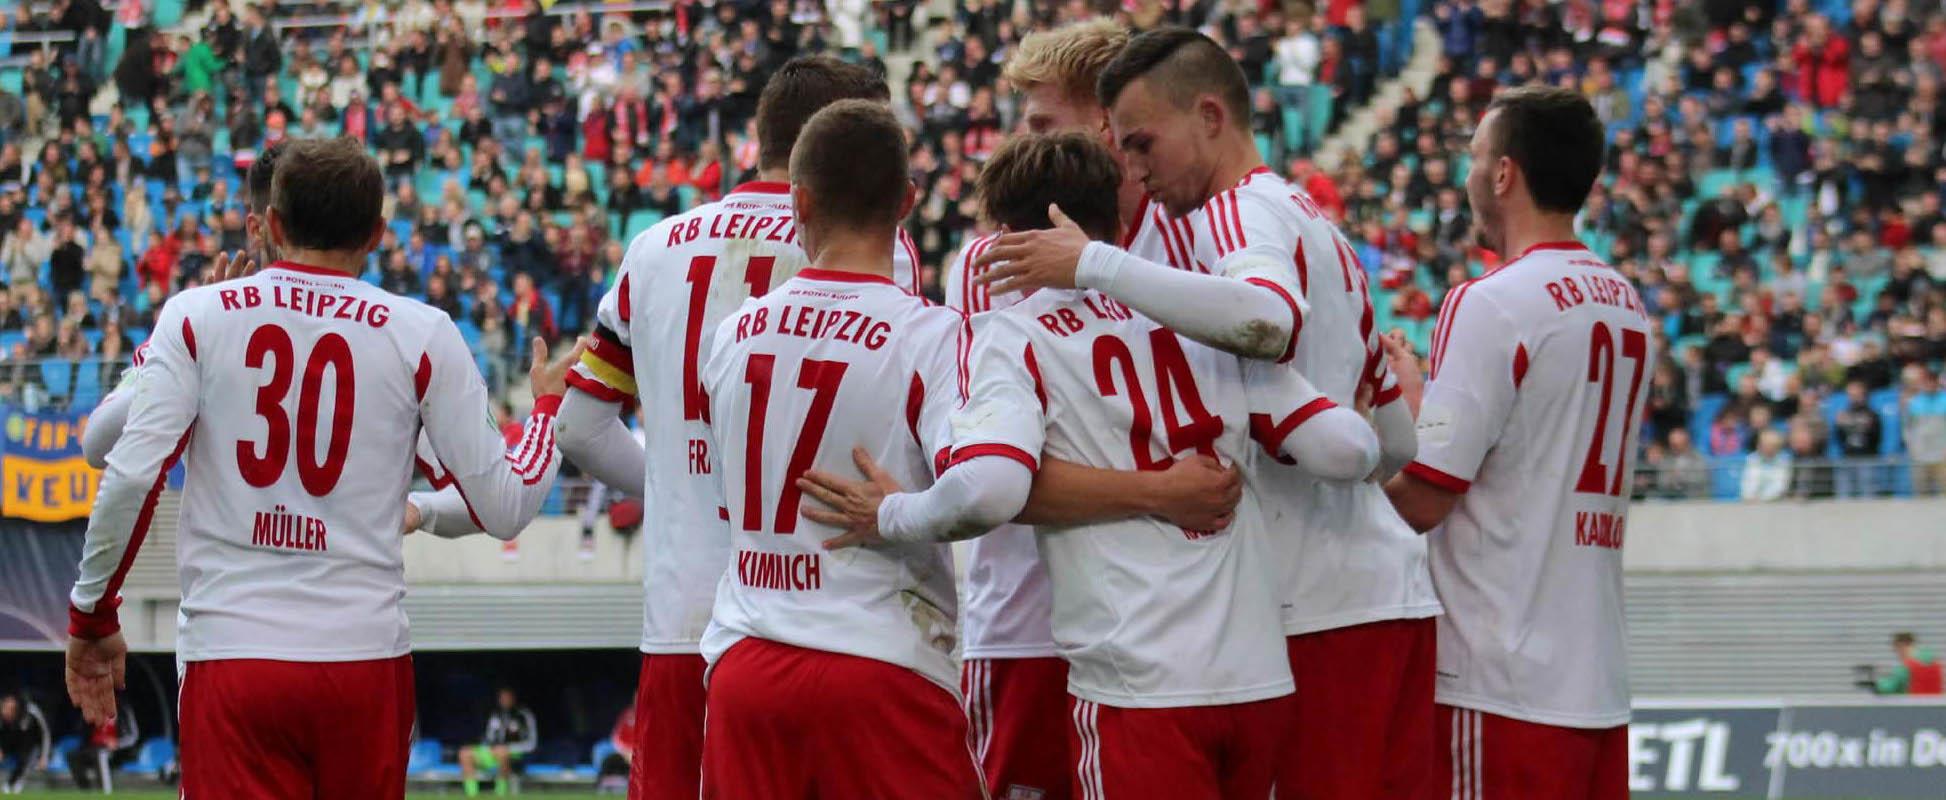 3. Runde Sachsenpokal_1. FC Lok - RB Leipzig